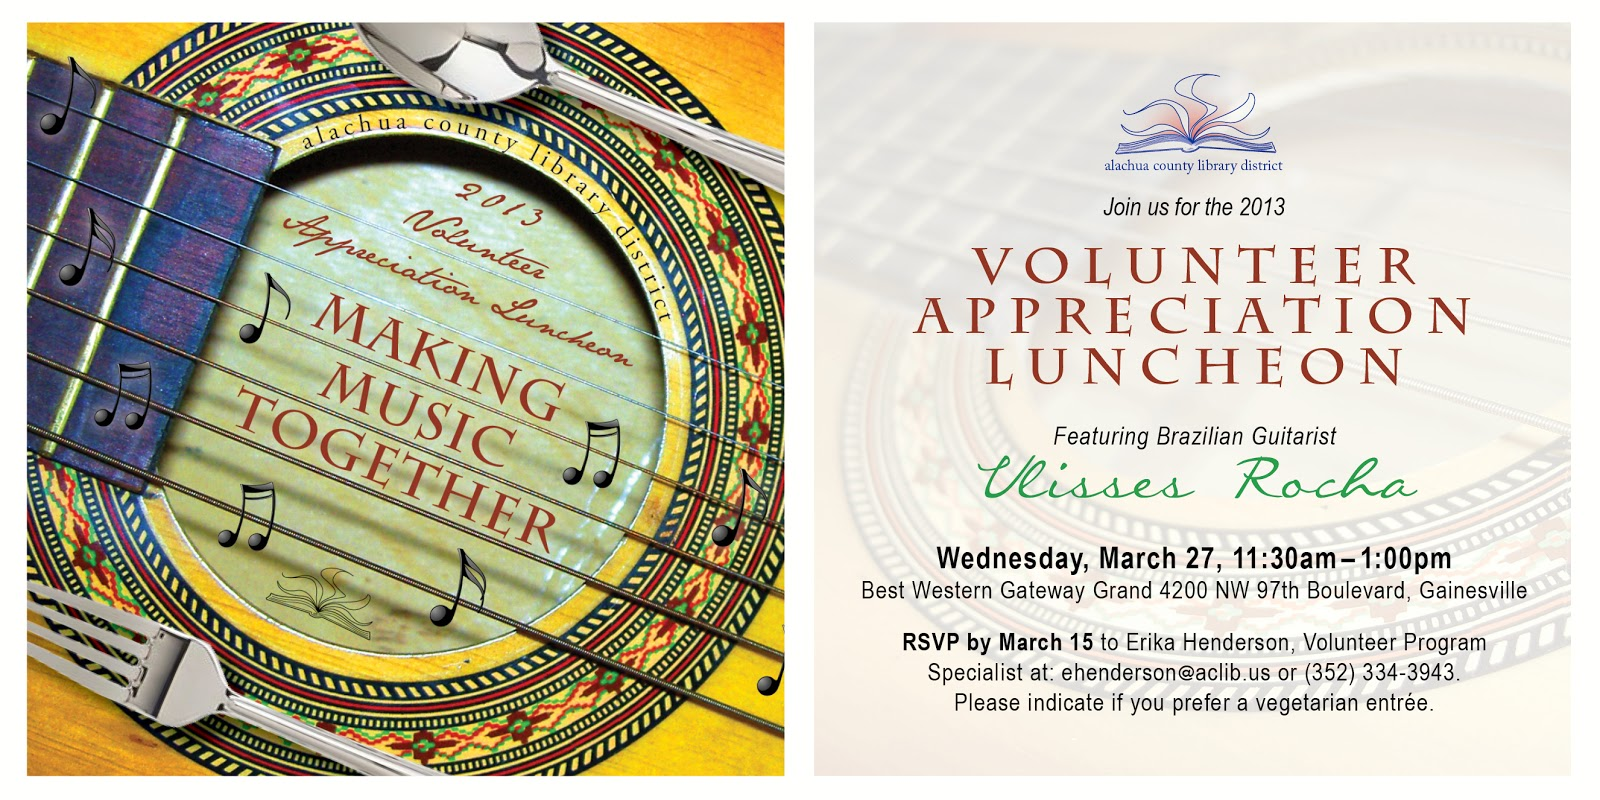 Library Volunteer Appreciation Luncheon Invitation Program Twice